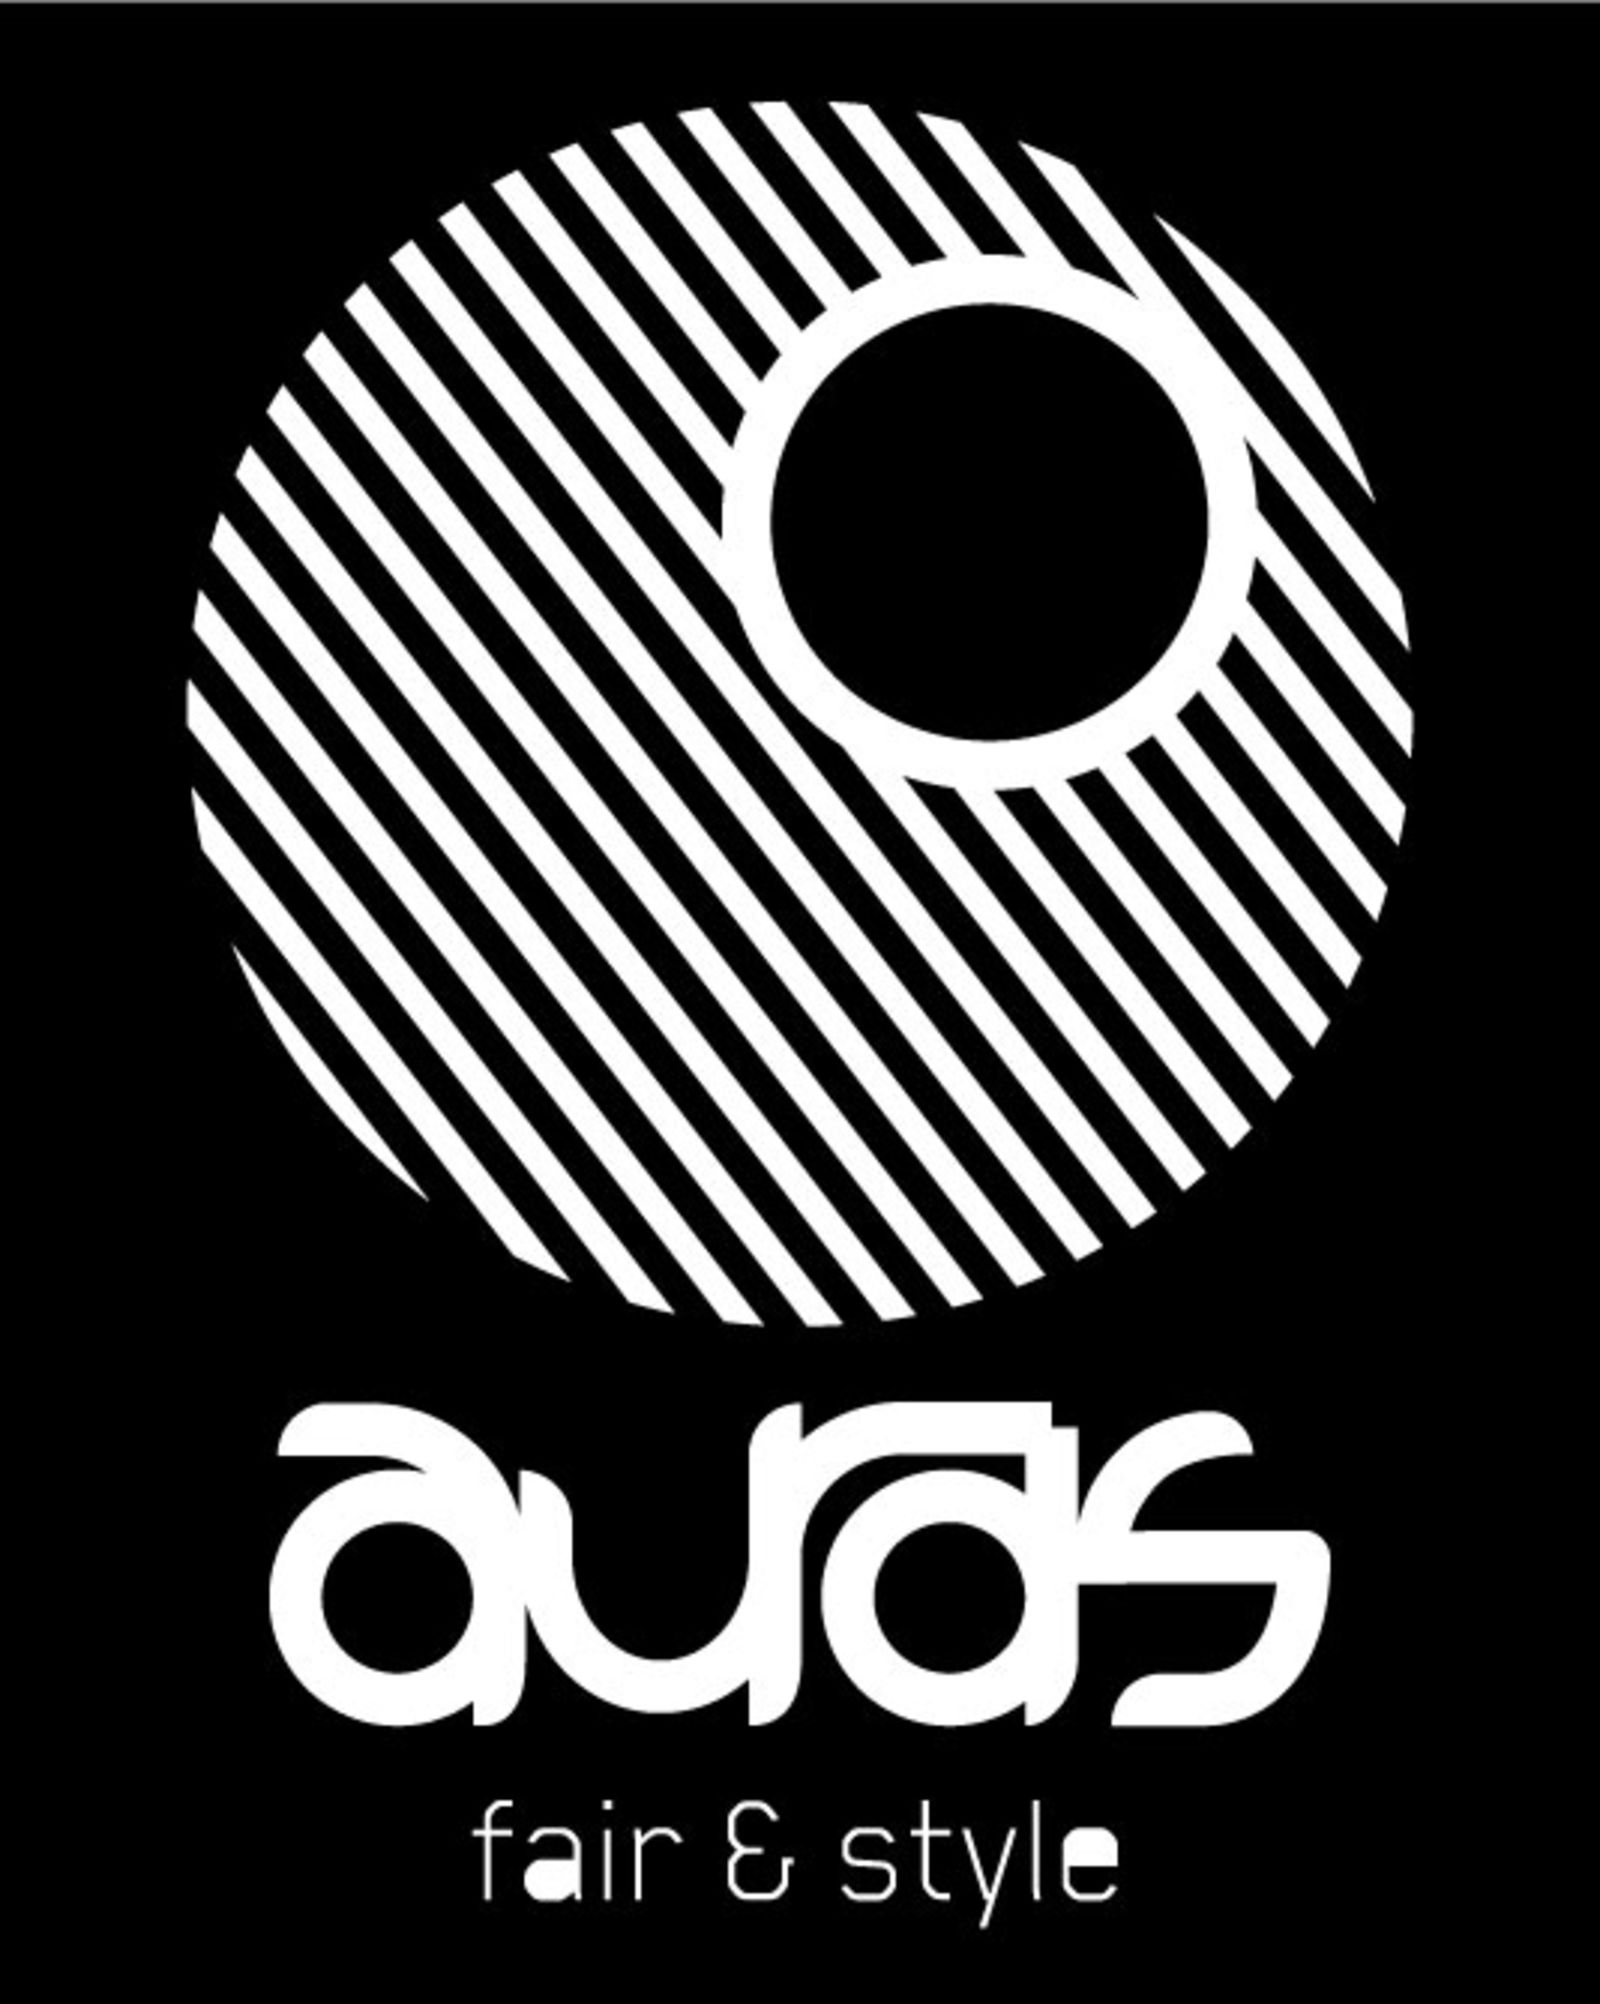 auras fair & style (Bild 1)